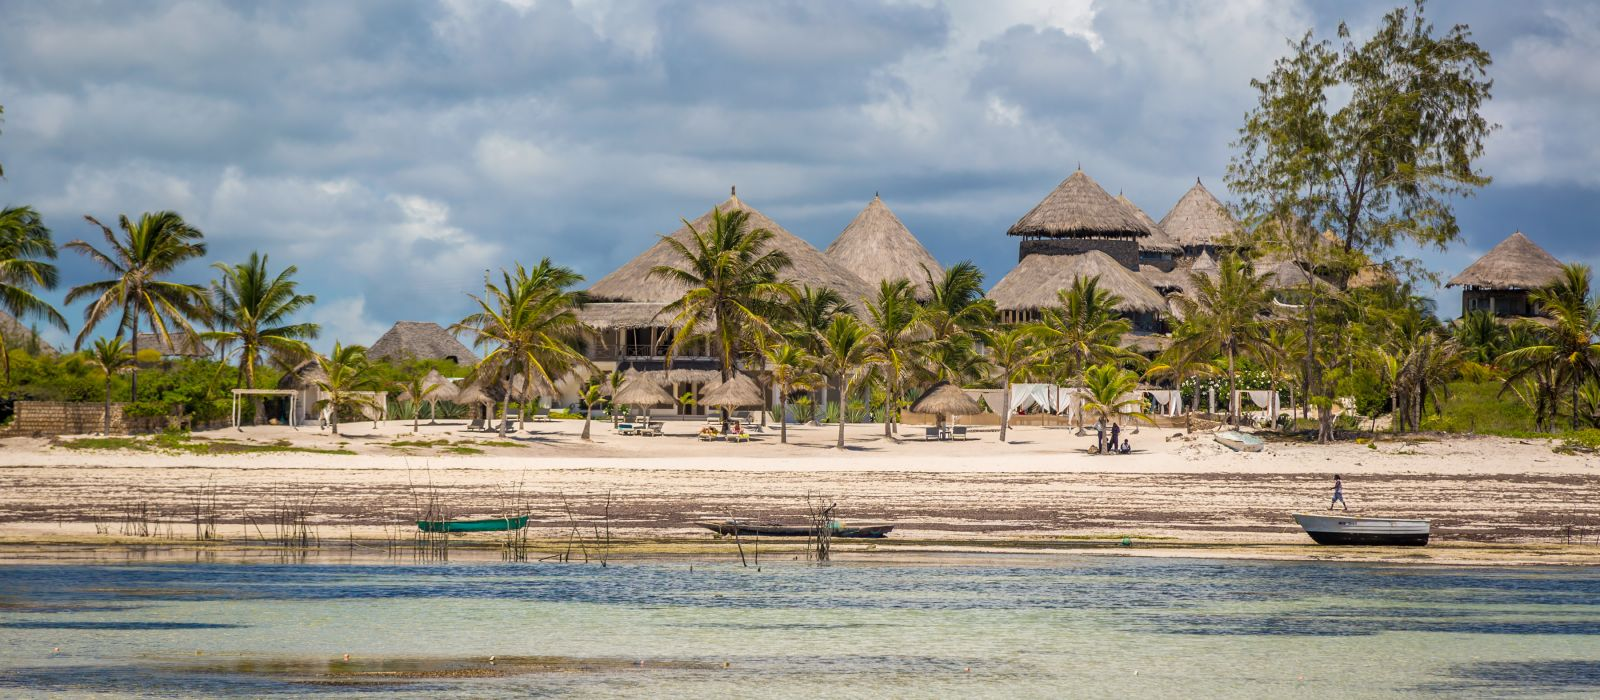 Beautiful beach in Watamu, north shore of Kenya, East Africa